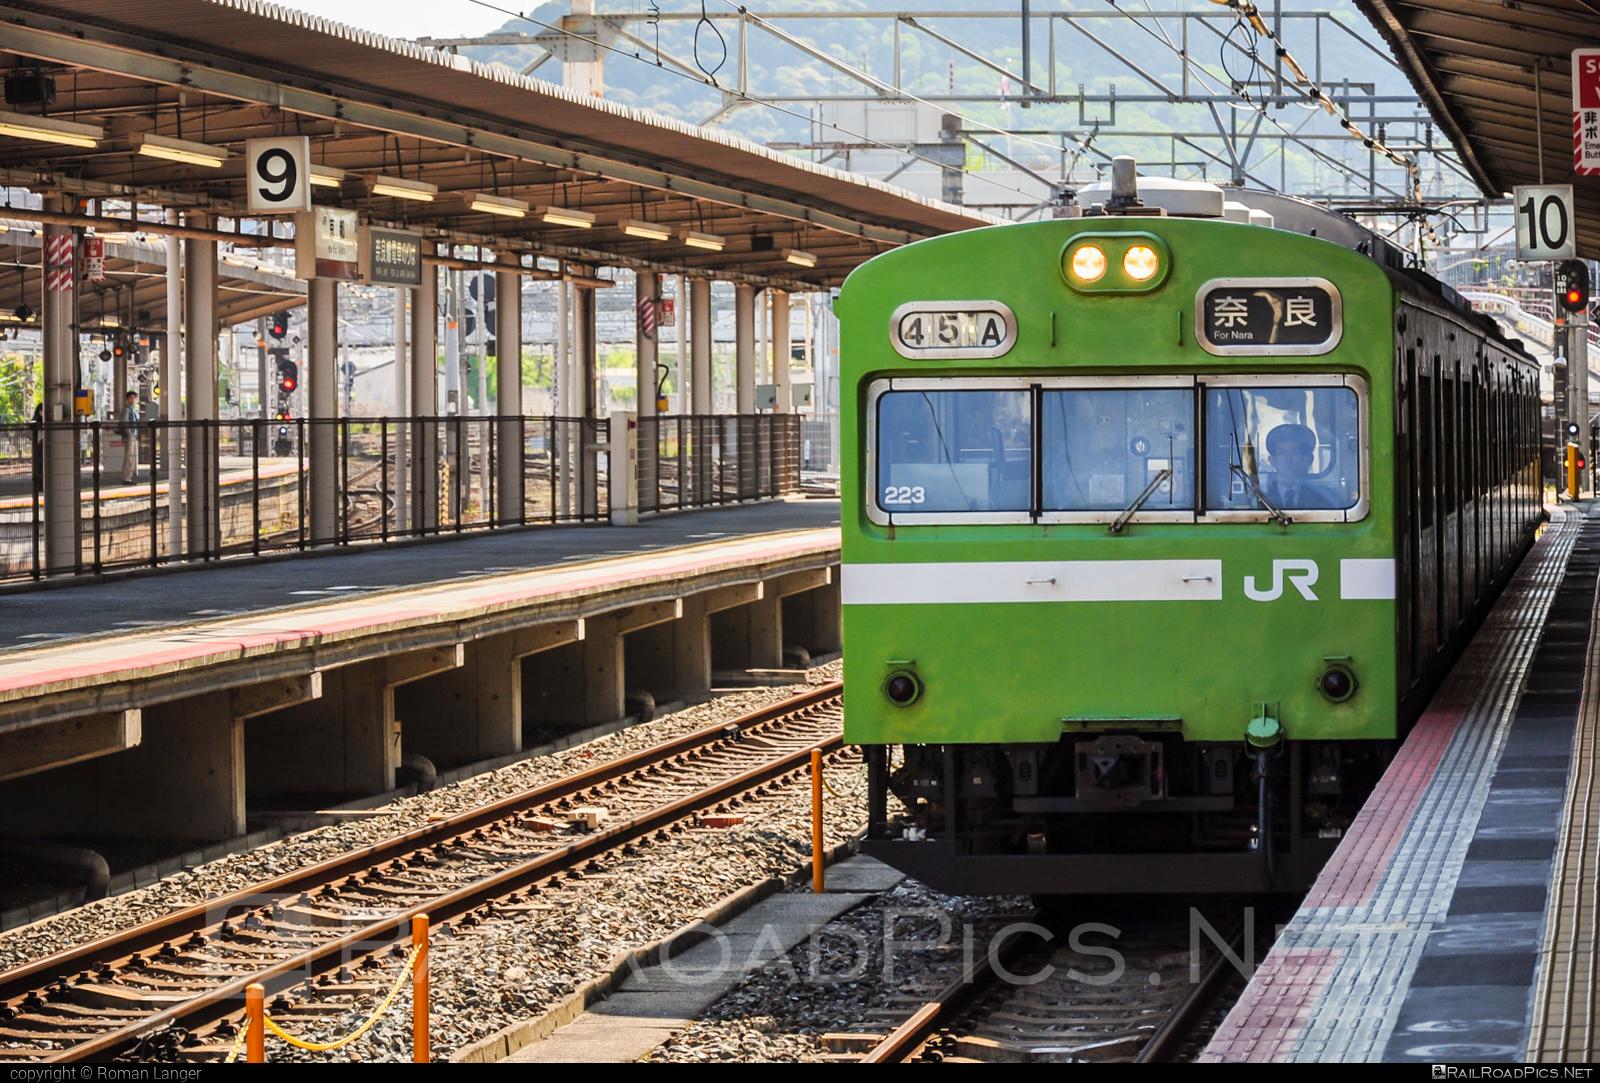 JNR Series 103 - 223 operated by JR West #jnr #jnr103series #jnrseries103 #jr103series #jrseries103 #jrwest